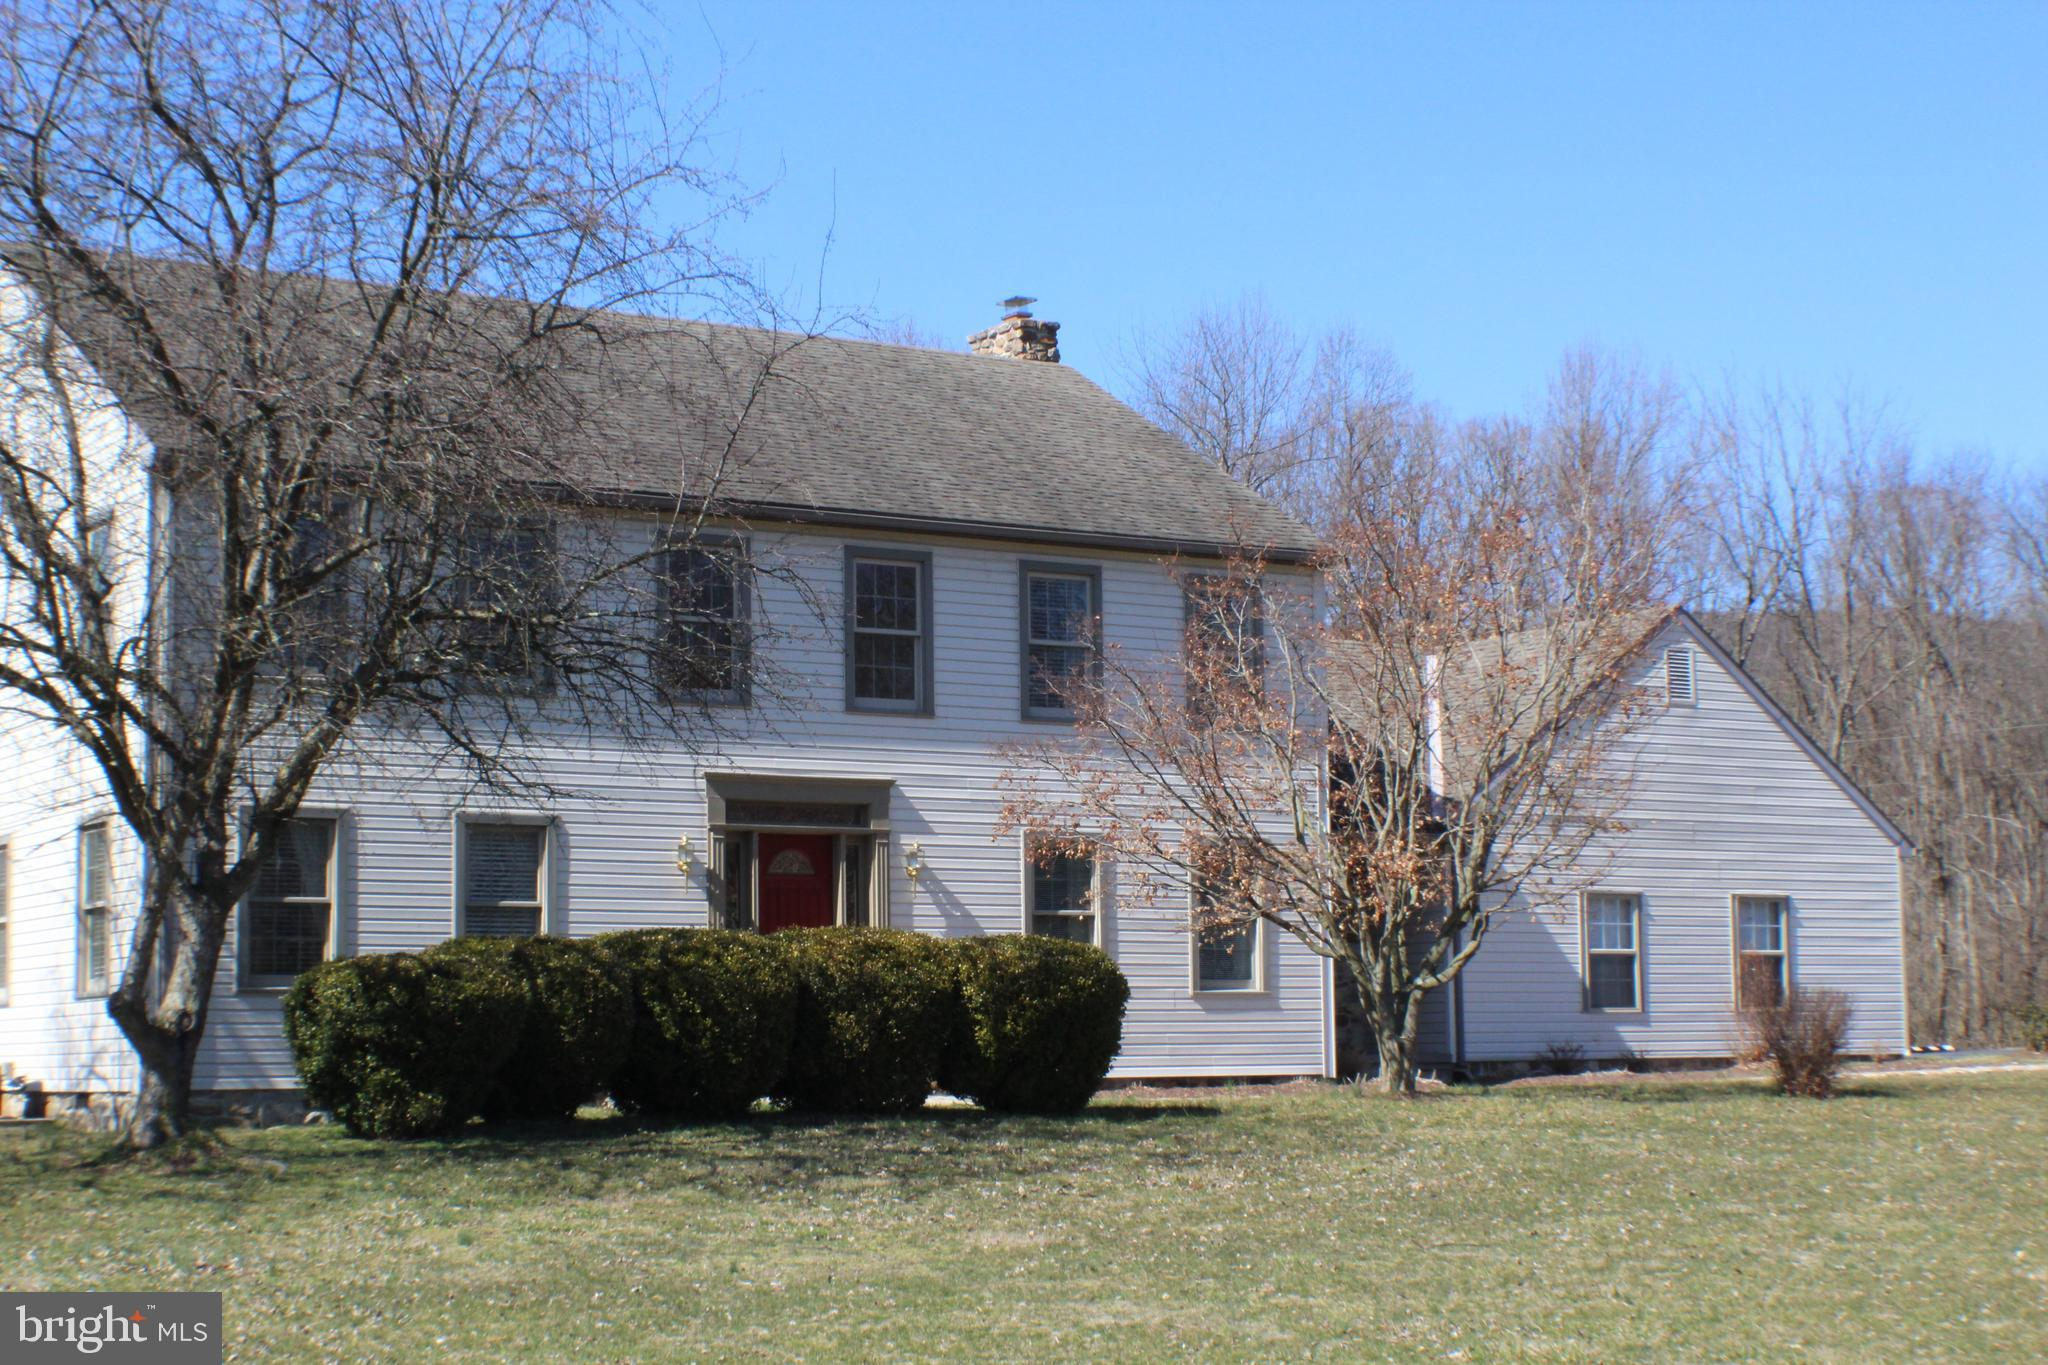 10185 BIRCHWOOD LANE, WAYNESBORO, PA 17268